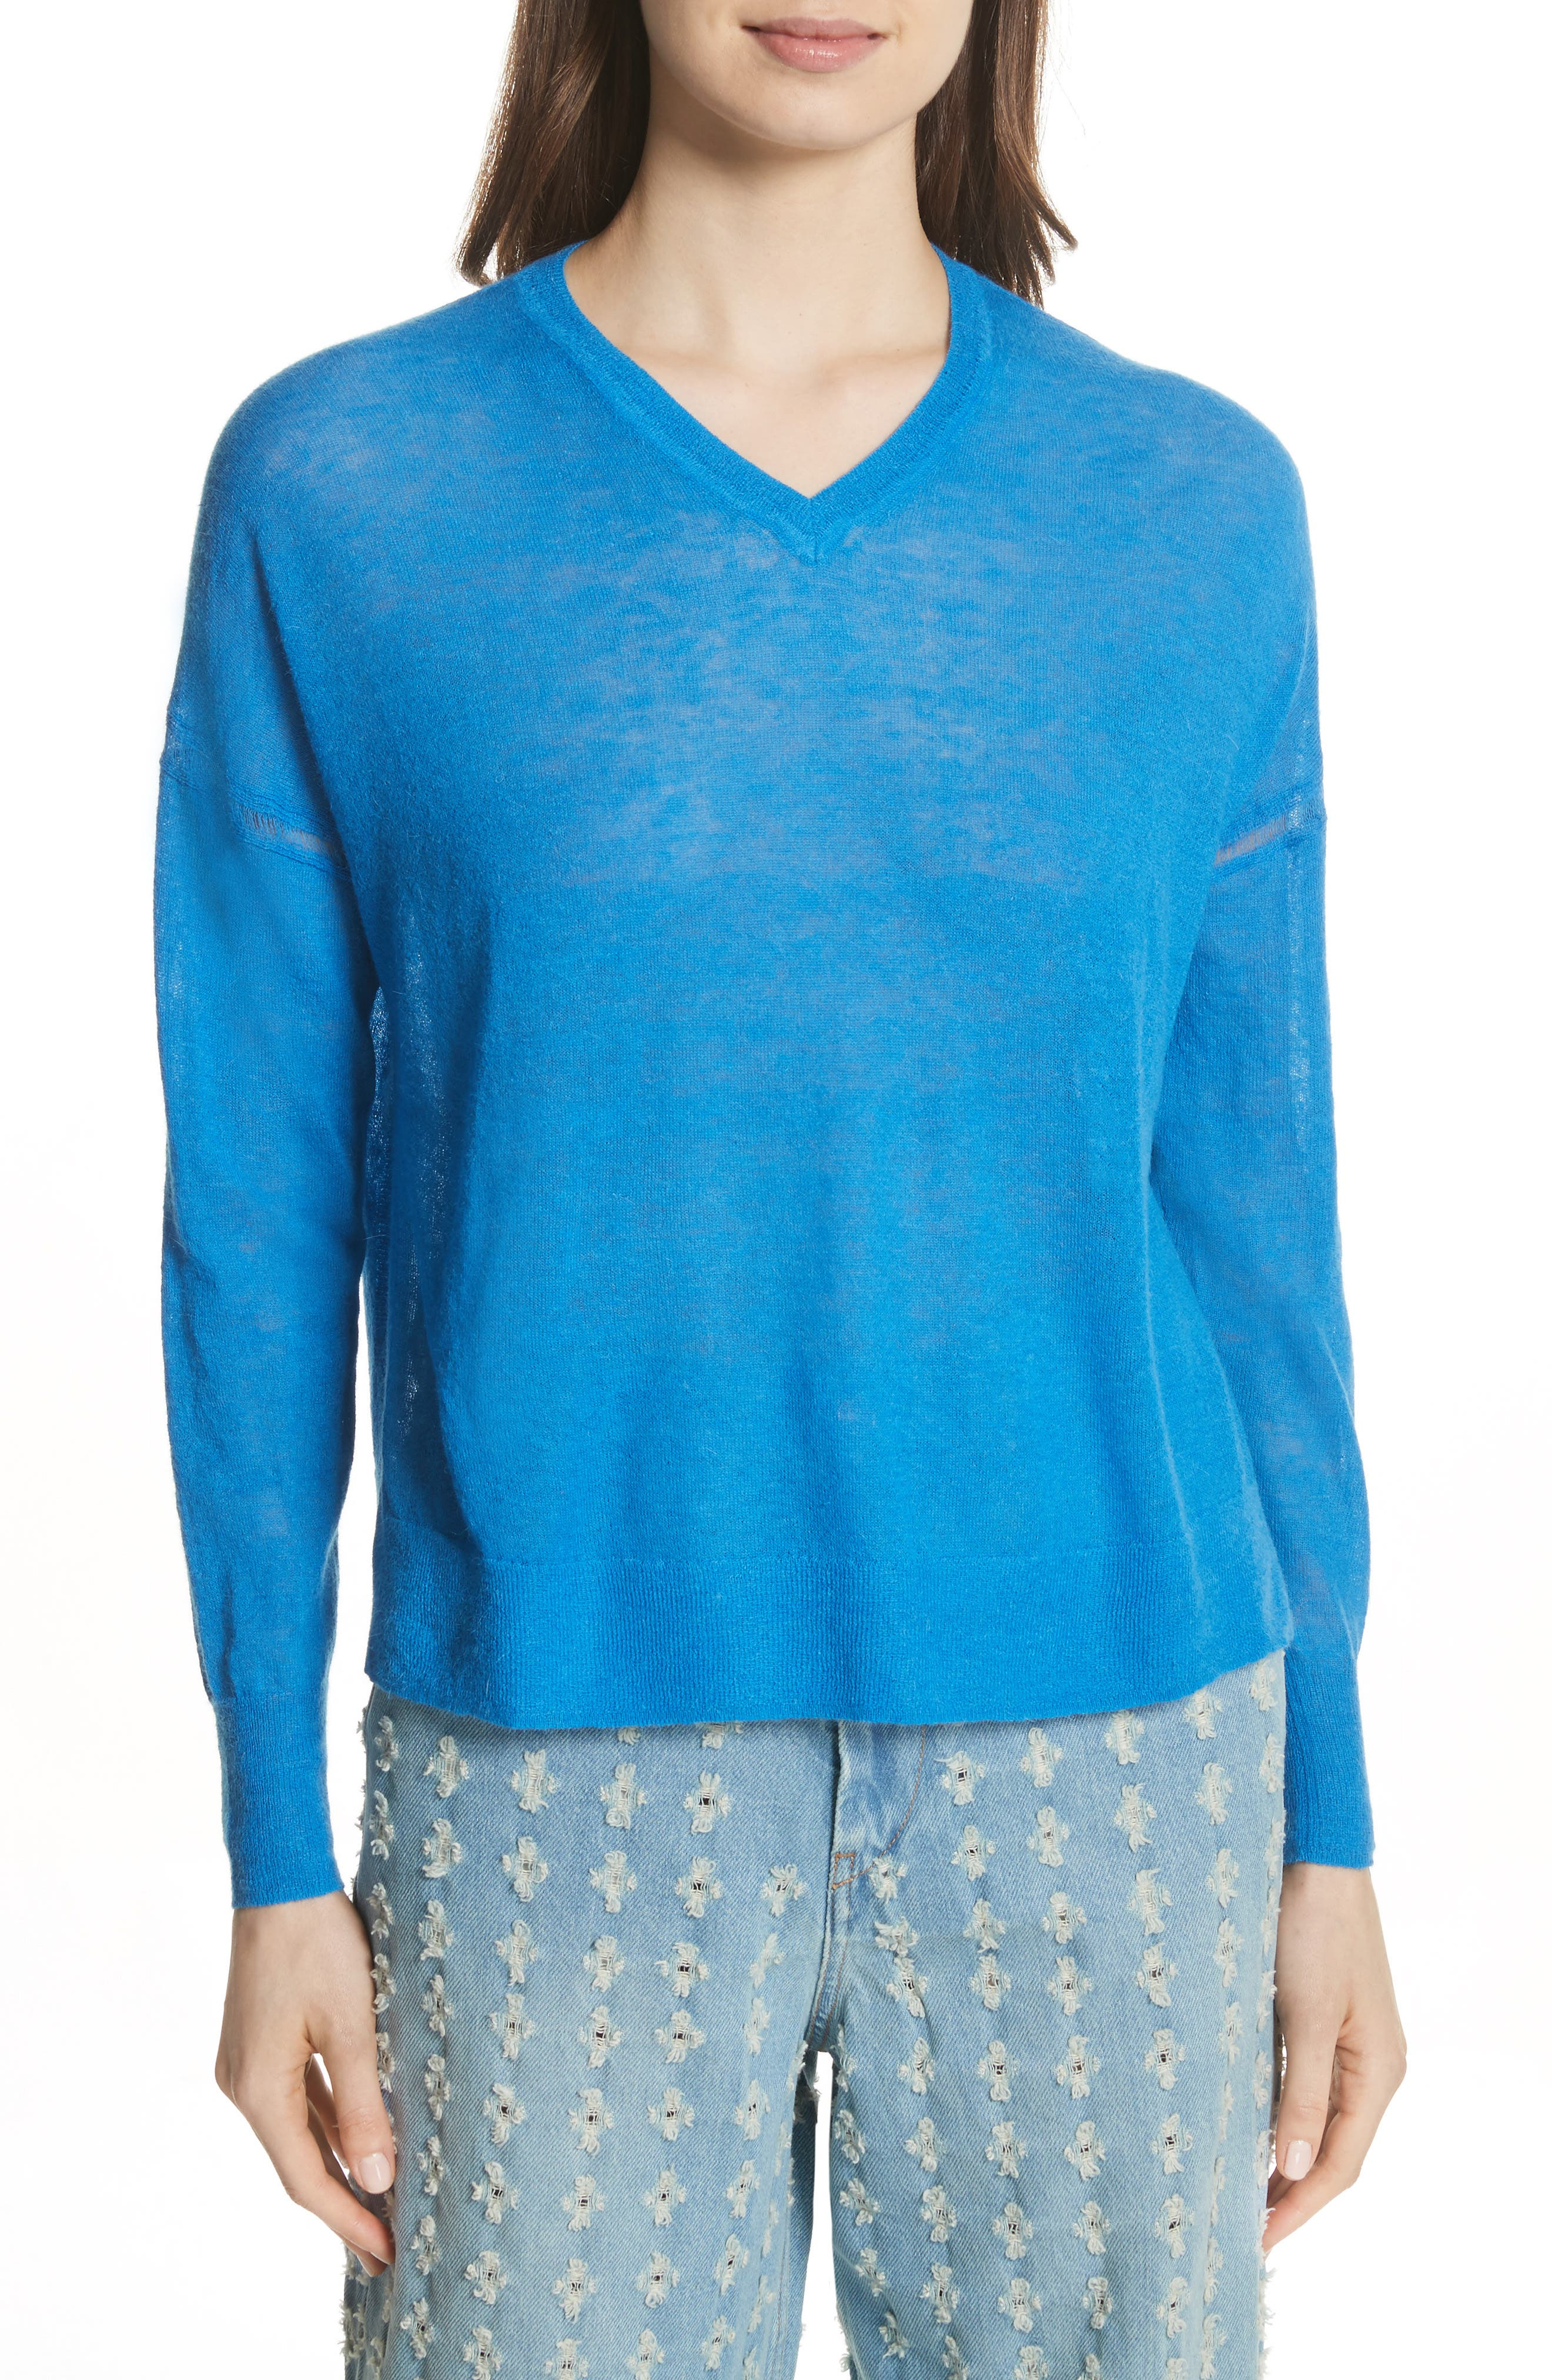 Isabel Marant Étoile Wool & Alpaca Blend Sweater